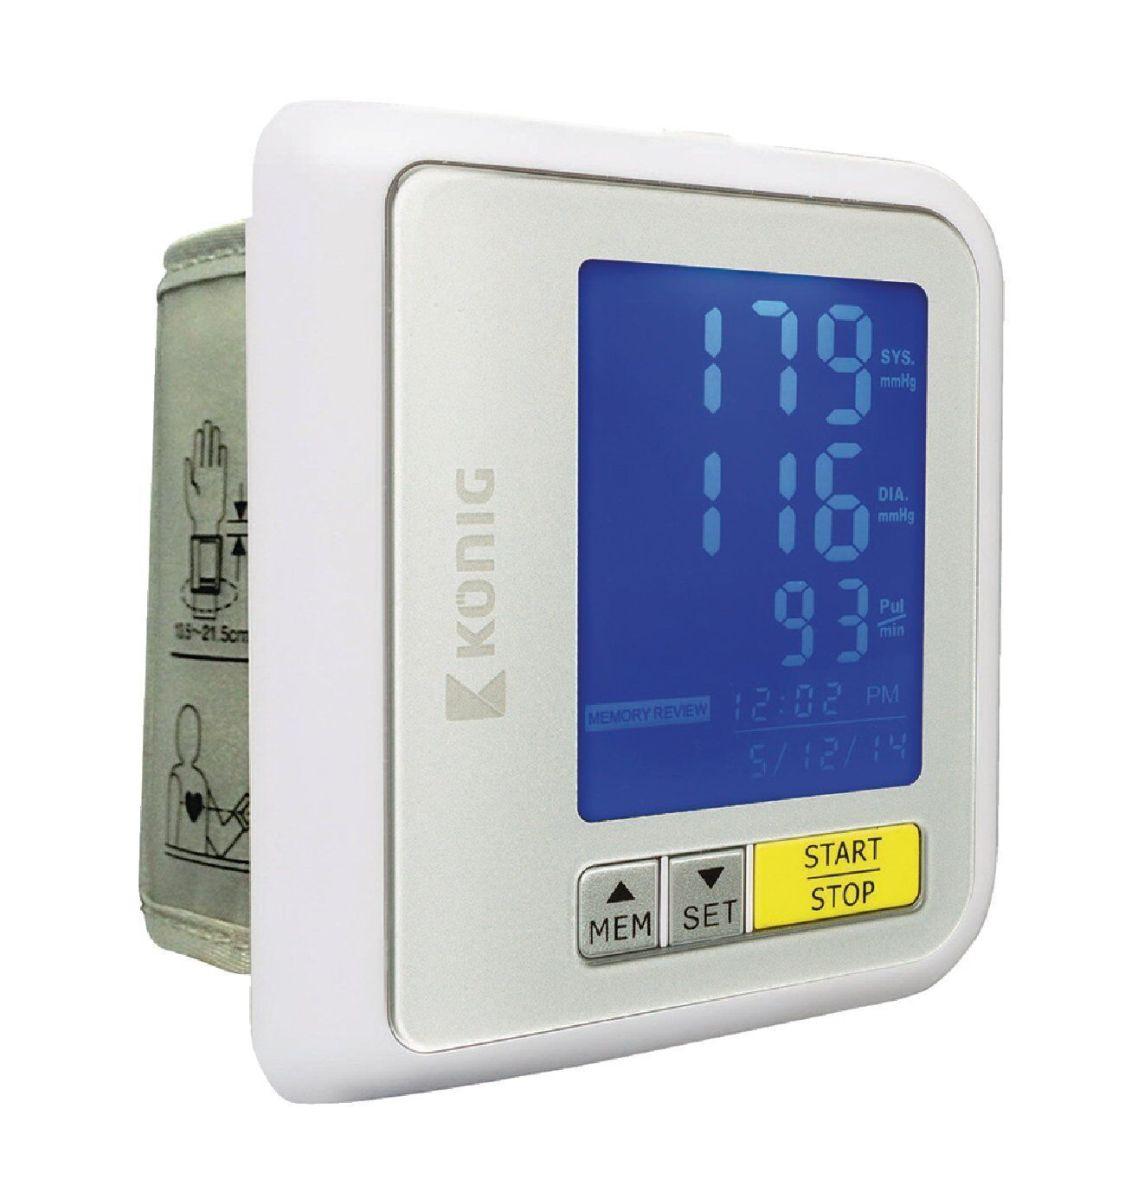 KÖNIG Bluetooth Blutdruckmessgerät Handgelenk Pulsmesser R4.1/F1-1577 UVP*= 49€